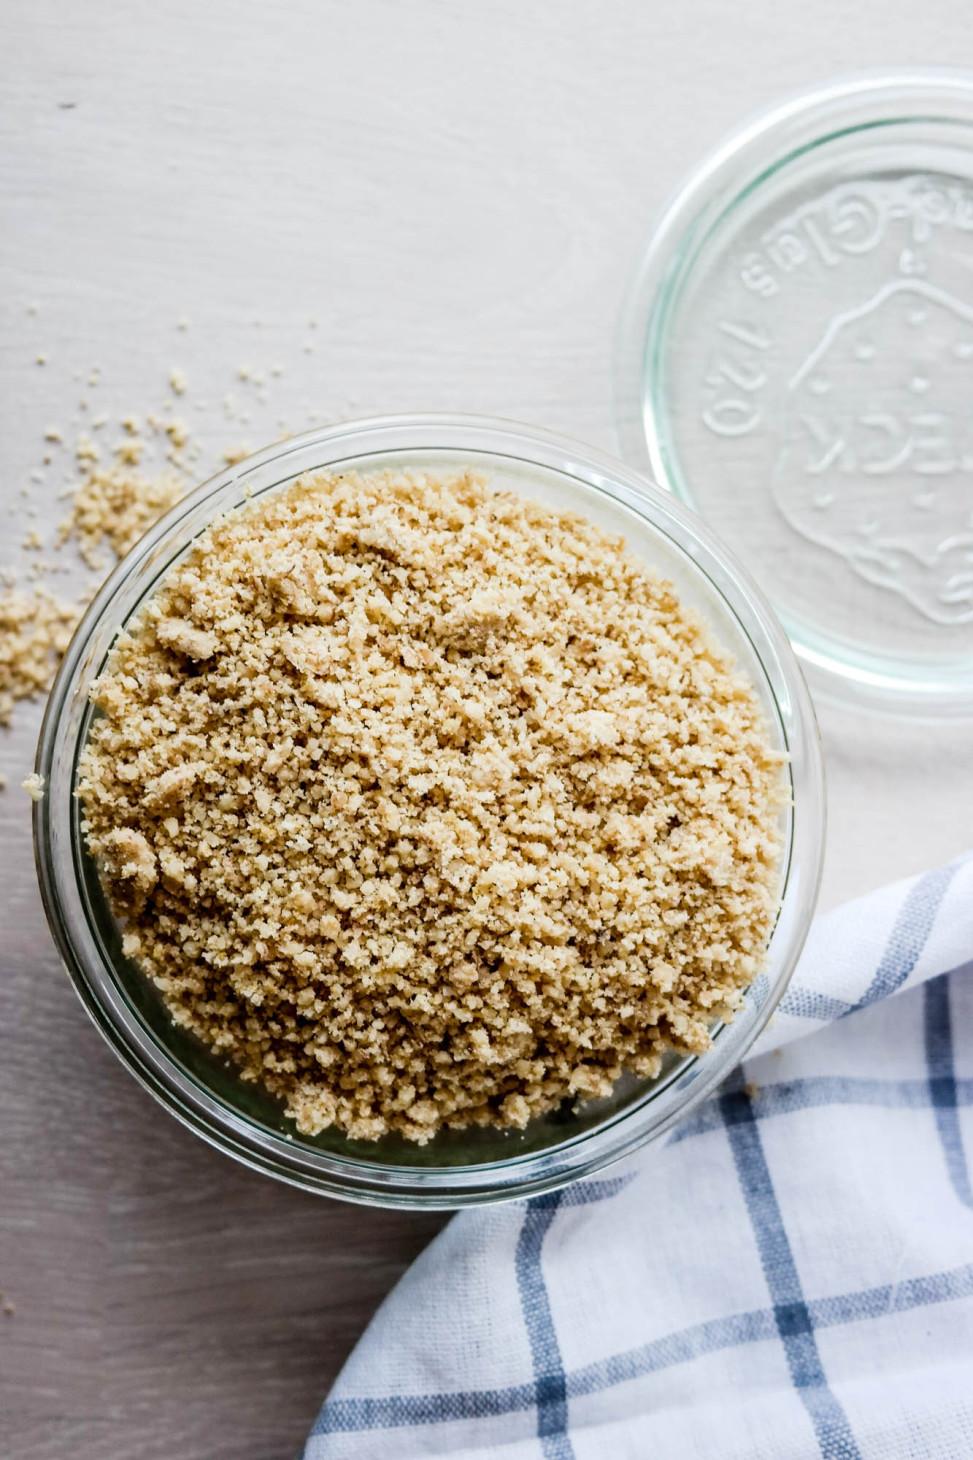 Nøtter kan aldri bli ost, men denne med valnøtter kan definitivt være en umami-bombe på pastaen.